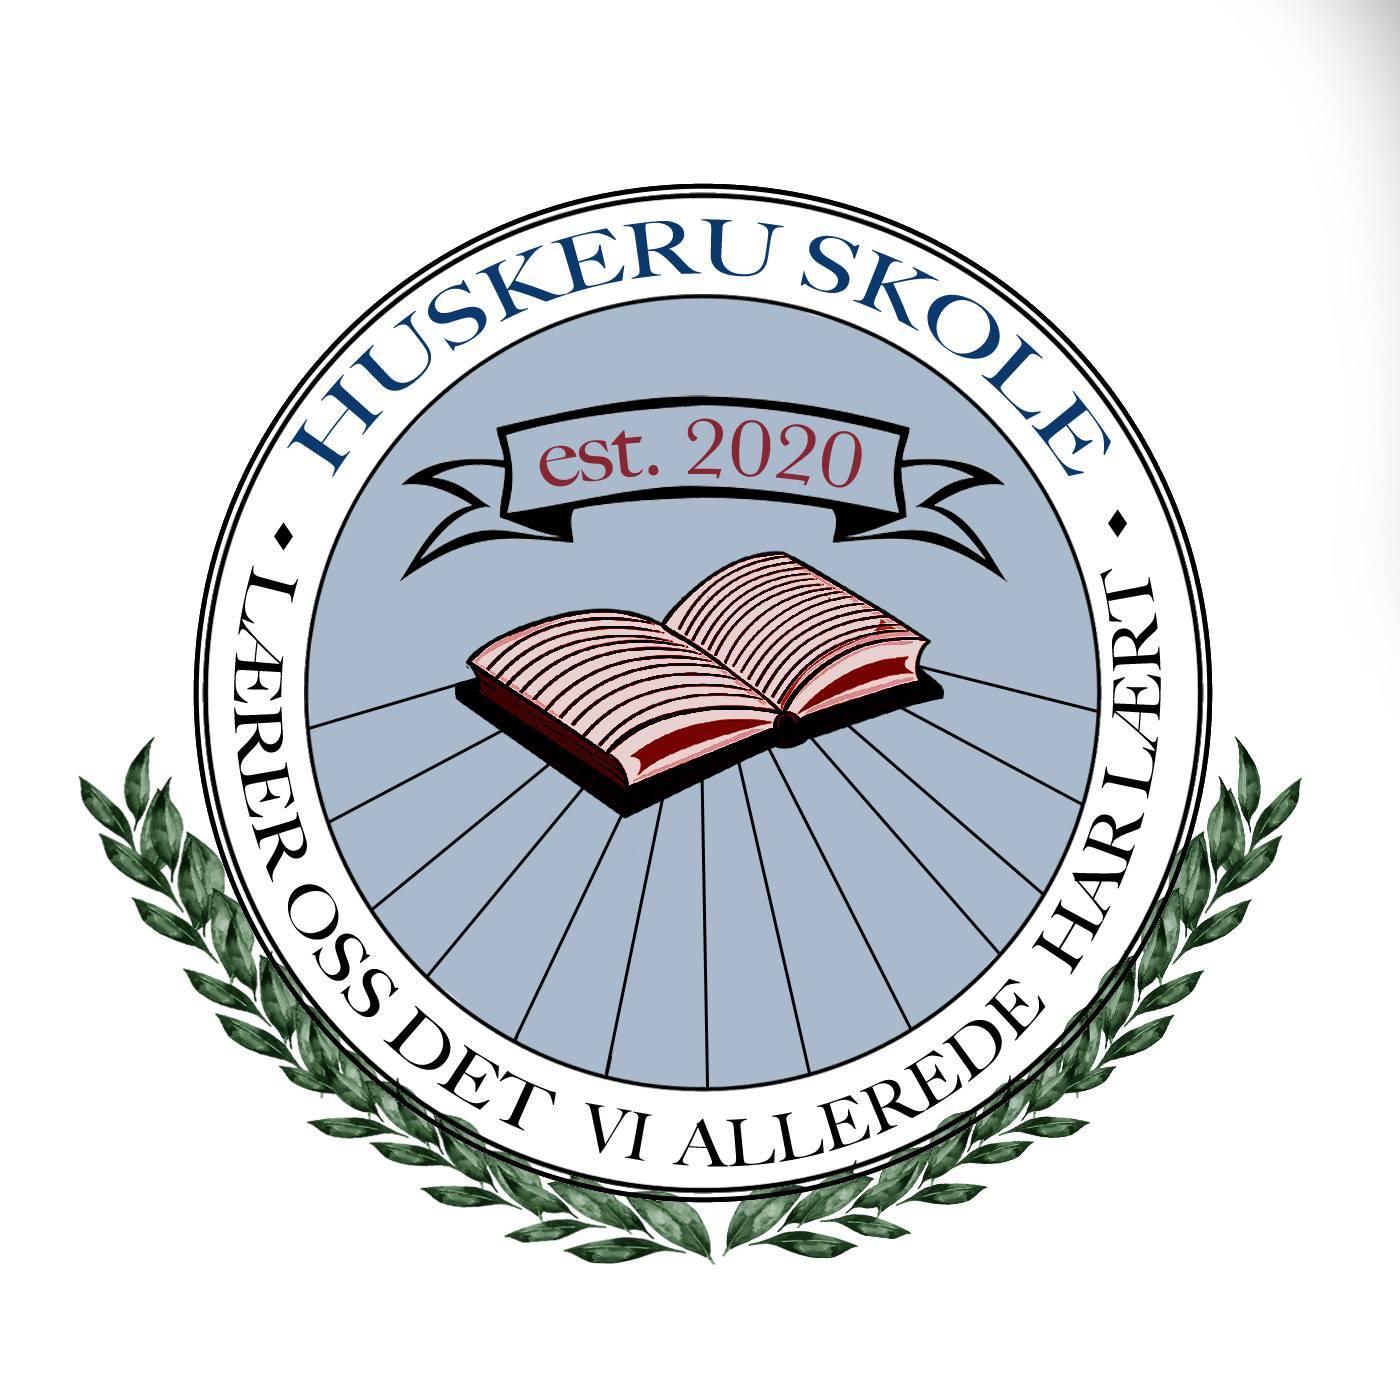 huskeru skole logo